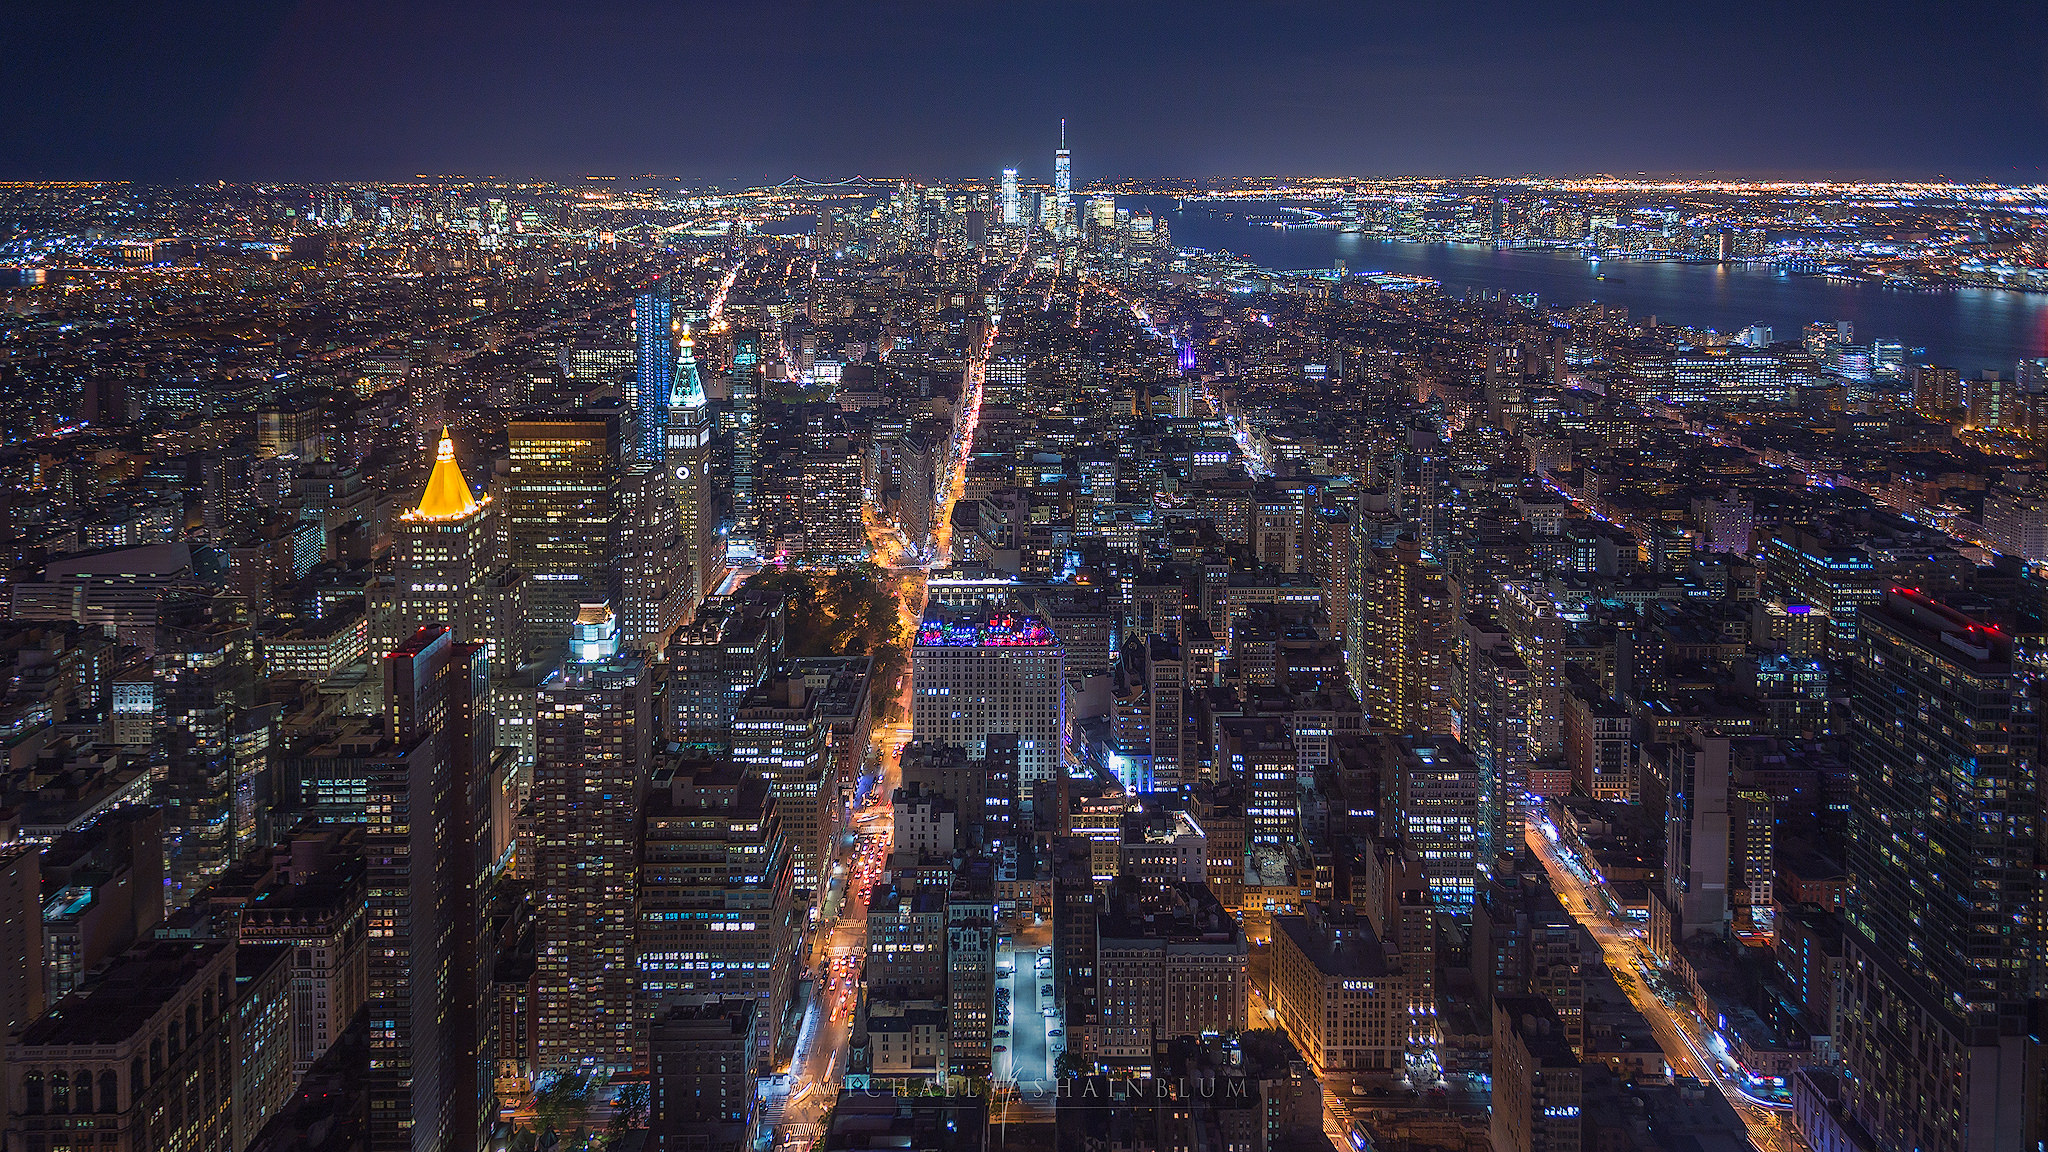 New York City Timelapse, Cityscape Photography